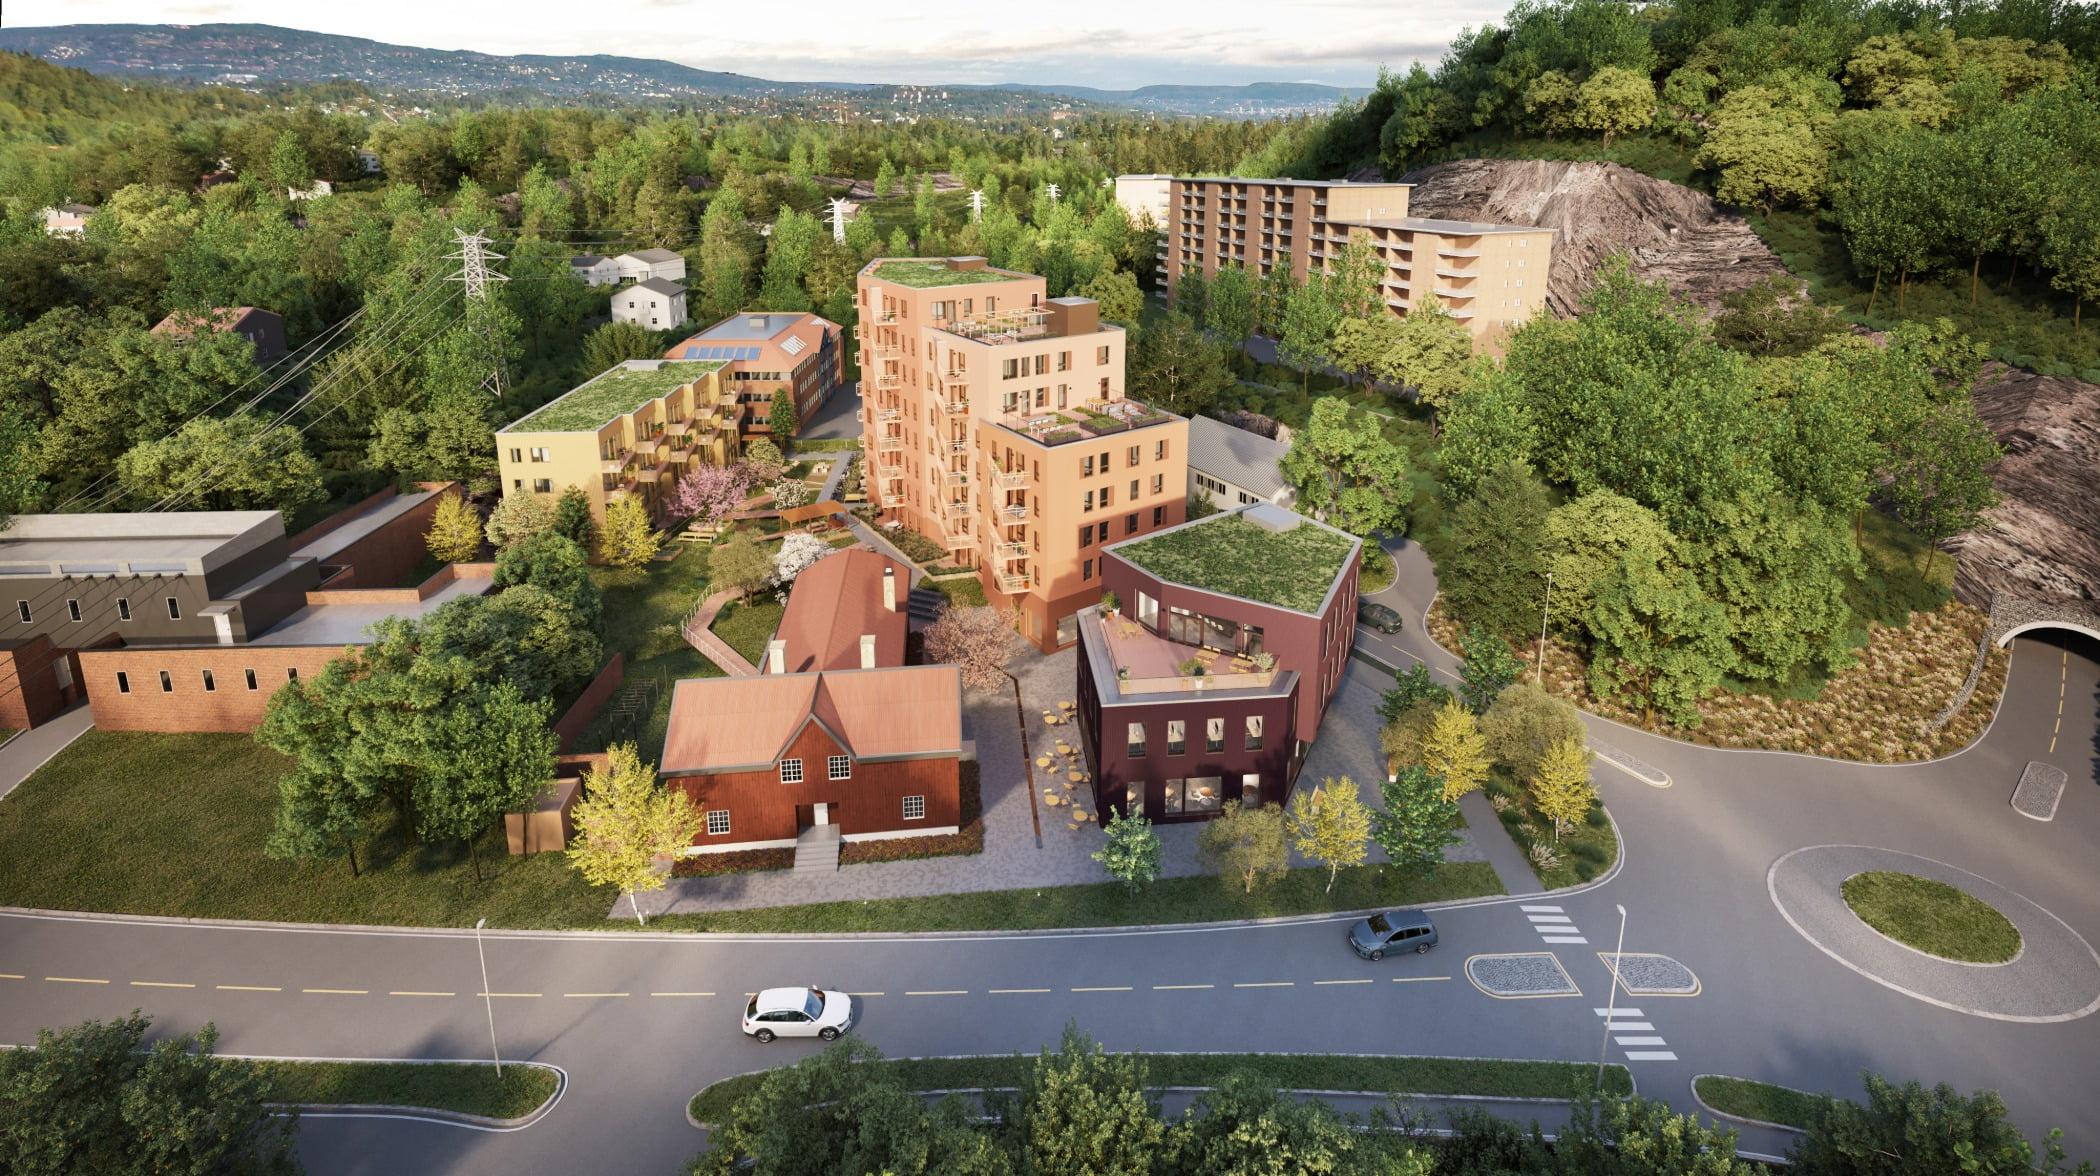 Urban design, Land lot, Plant, Building, Property, Window, Tree, Infrastructure, House, Sky